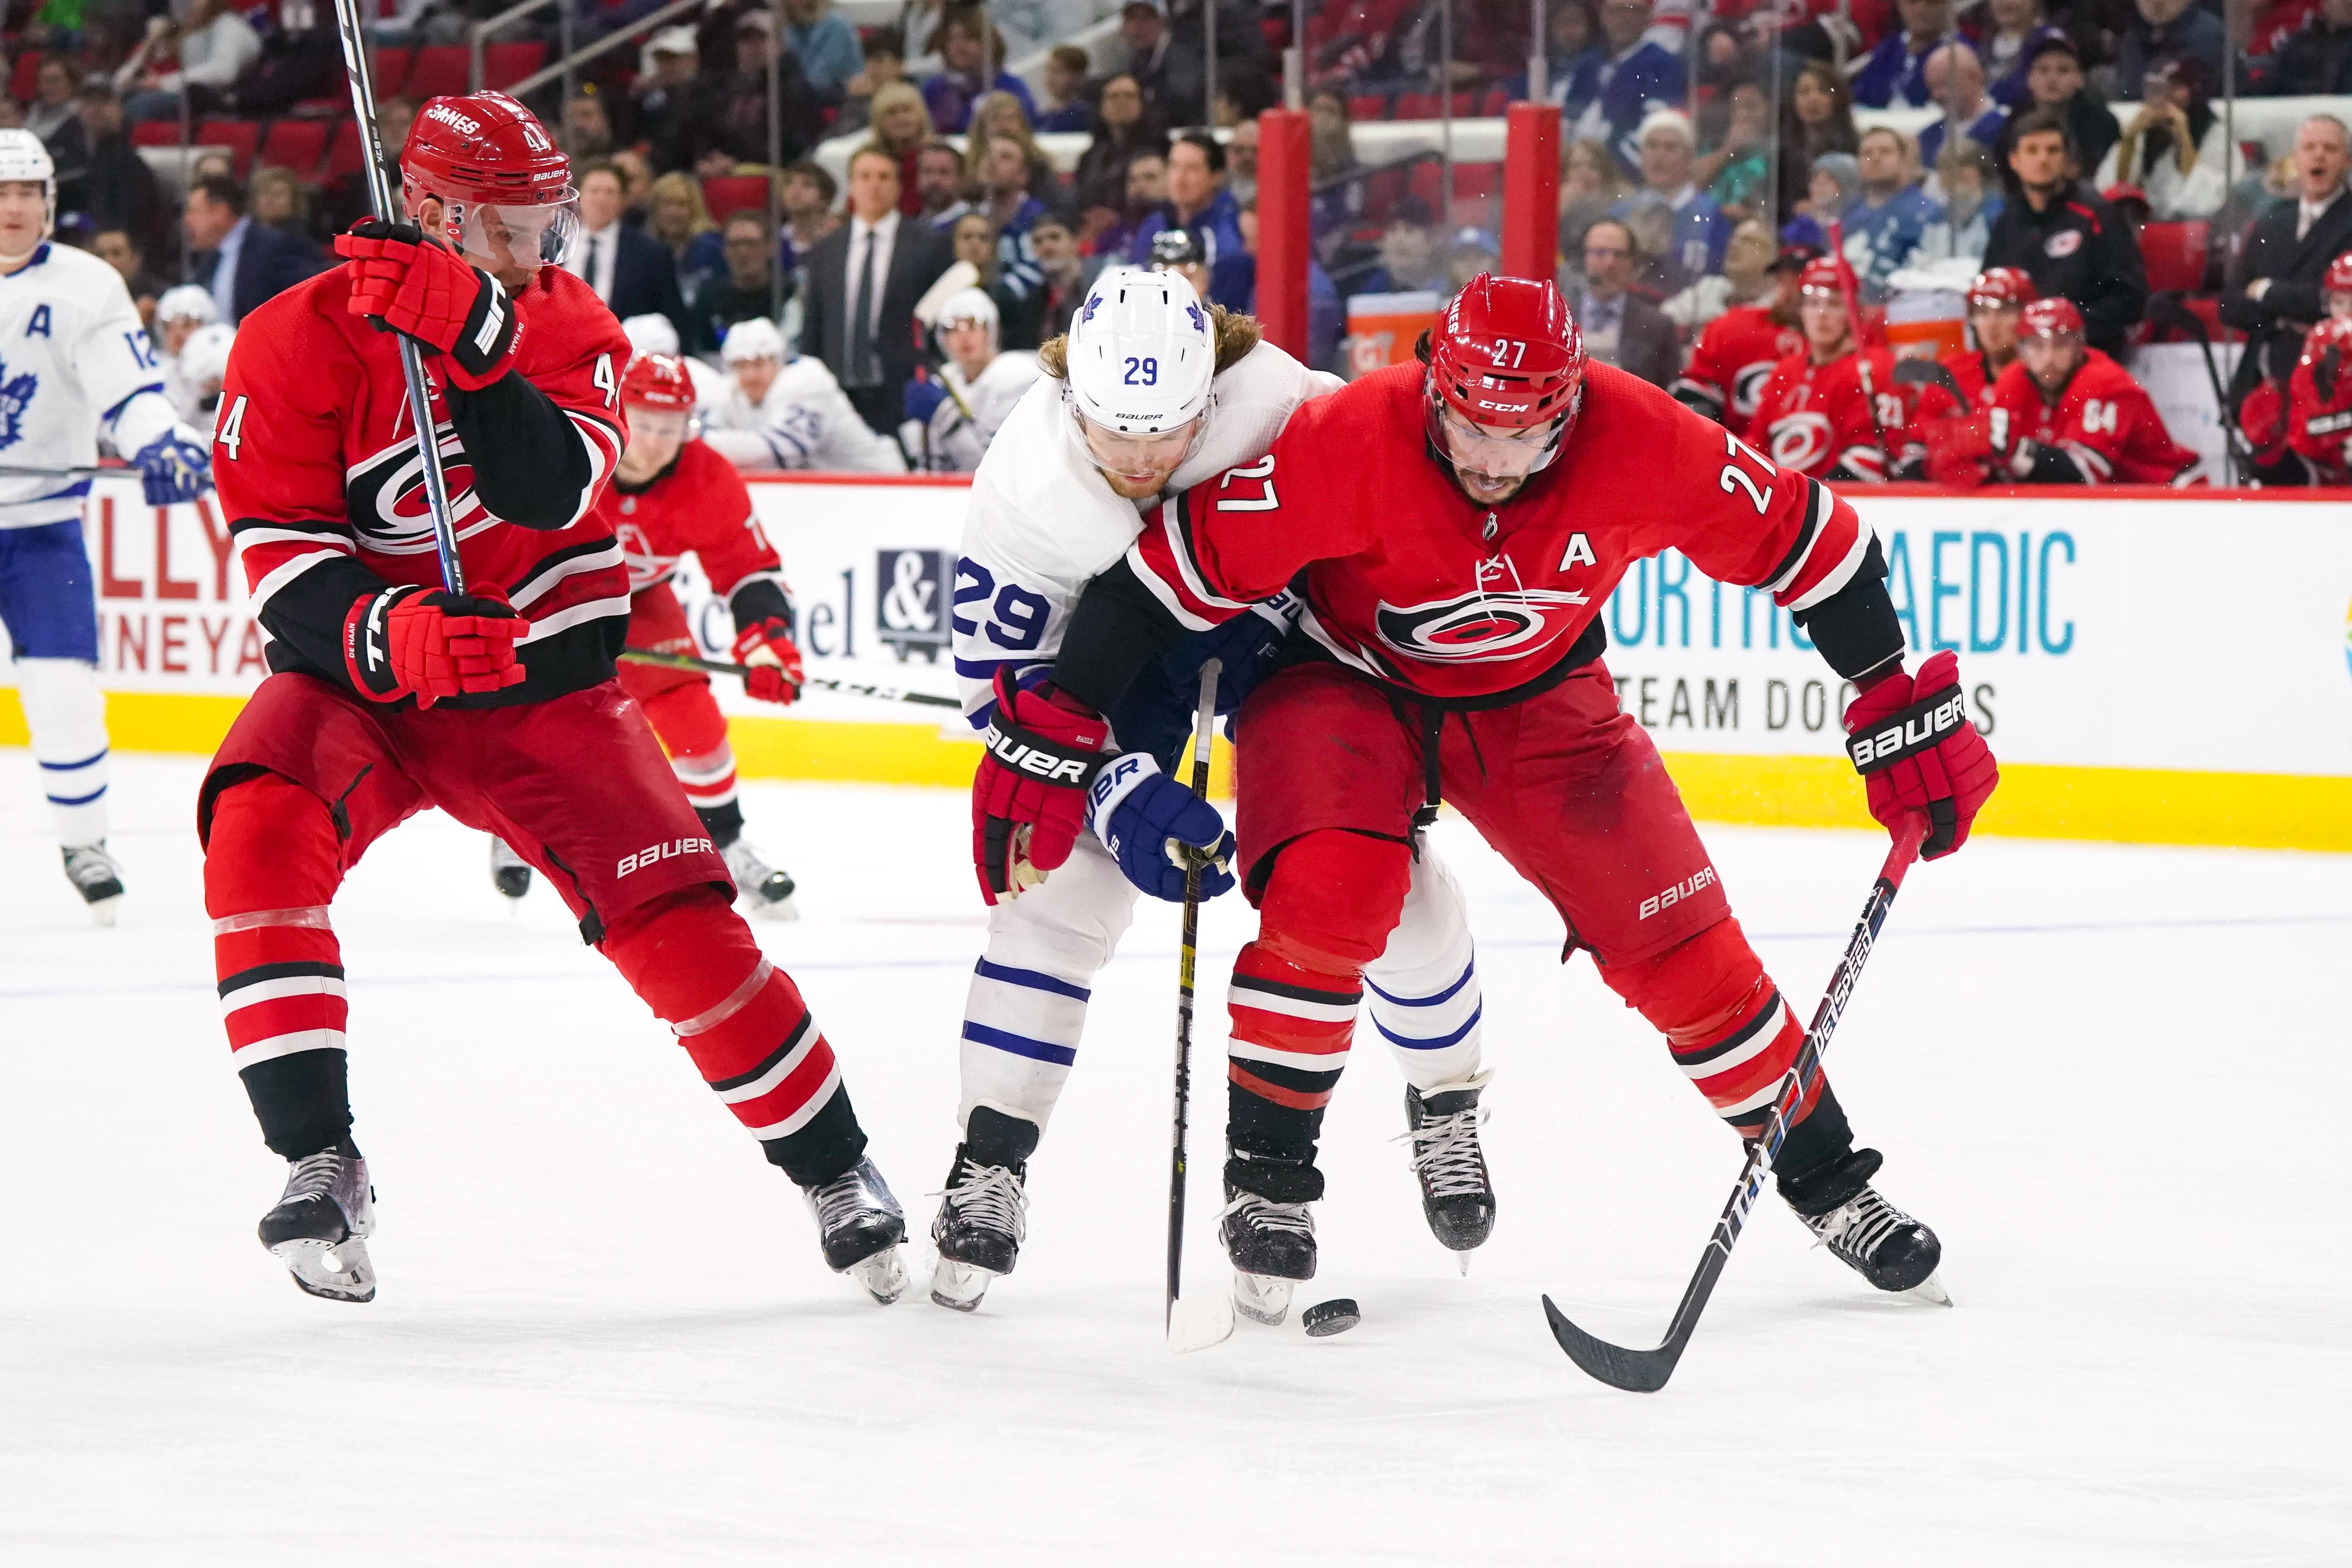 NHL: Toronto Maple Leafs at Carolina Hurricanes